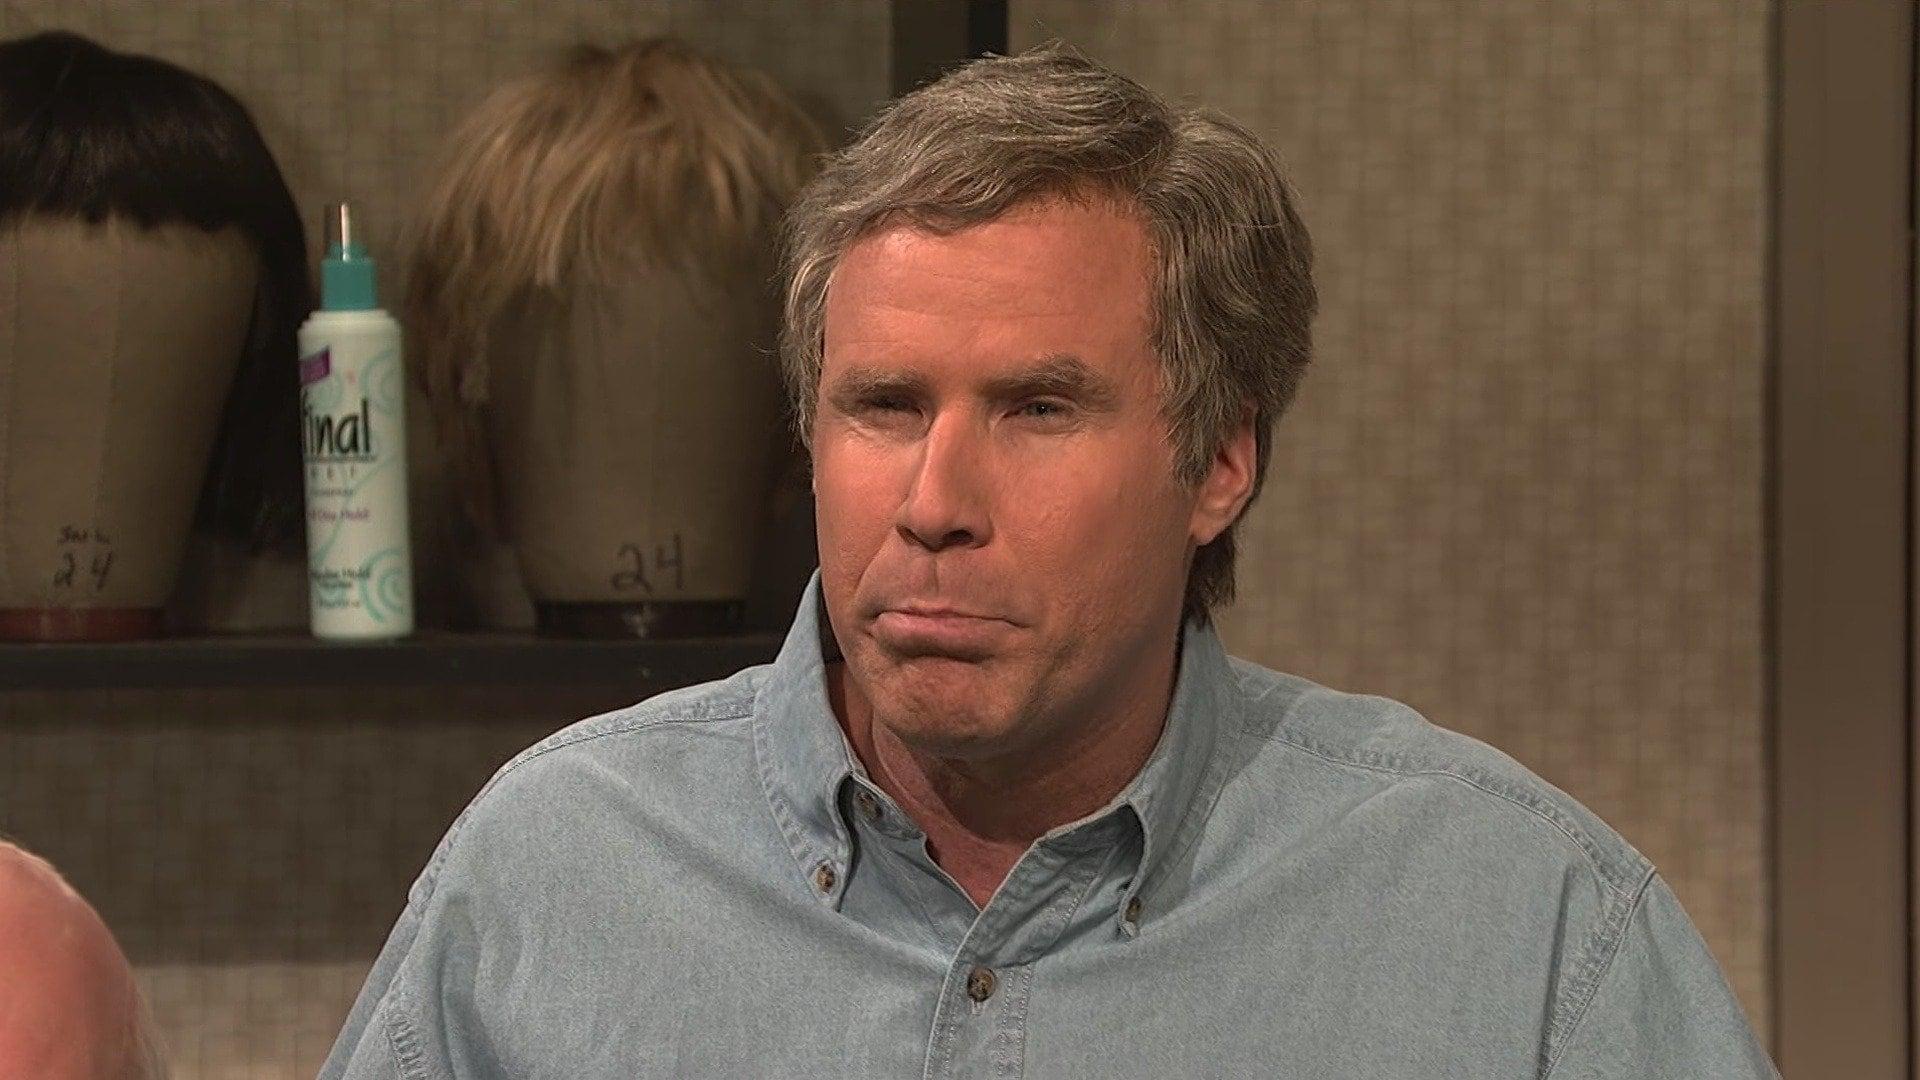 Will Ferrell: May 16, 2009